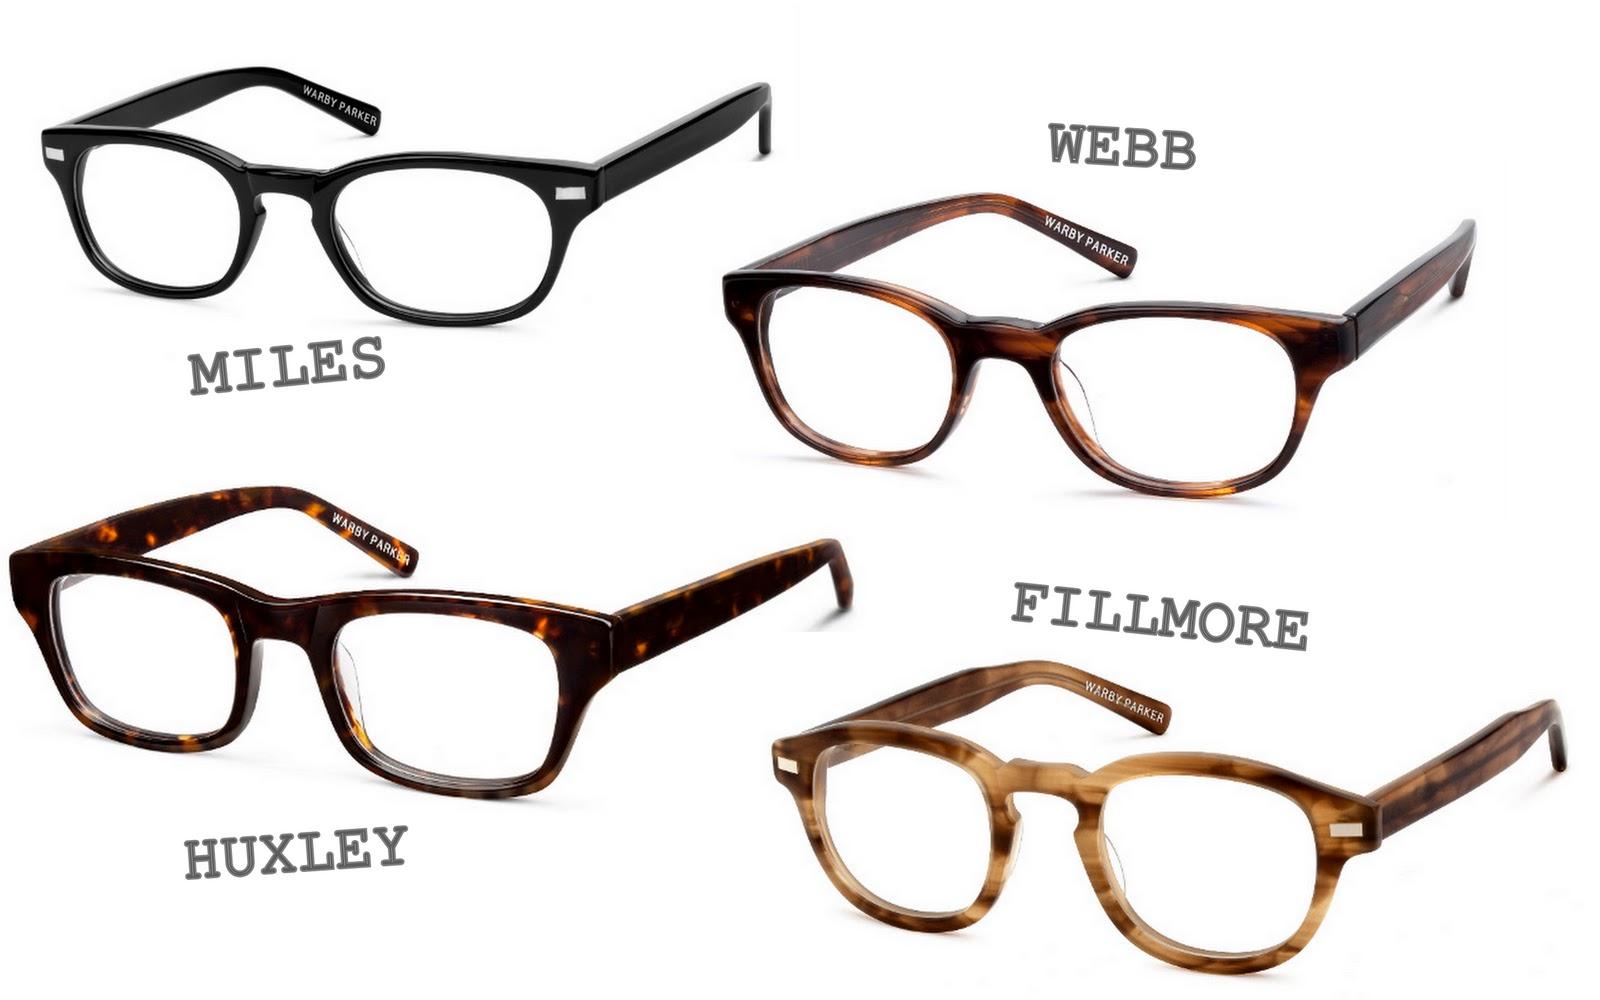 honey pied: new glasses?